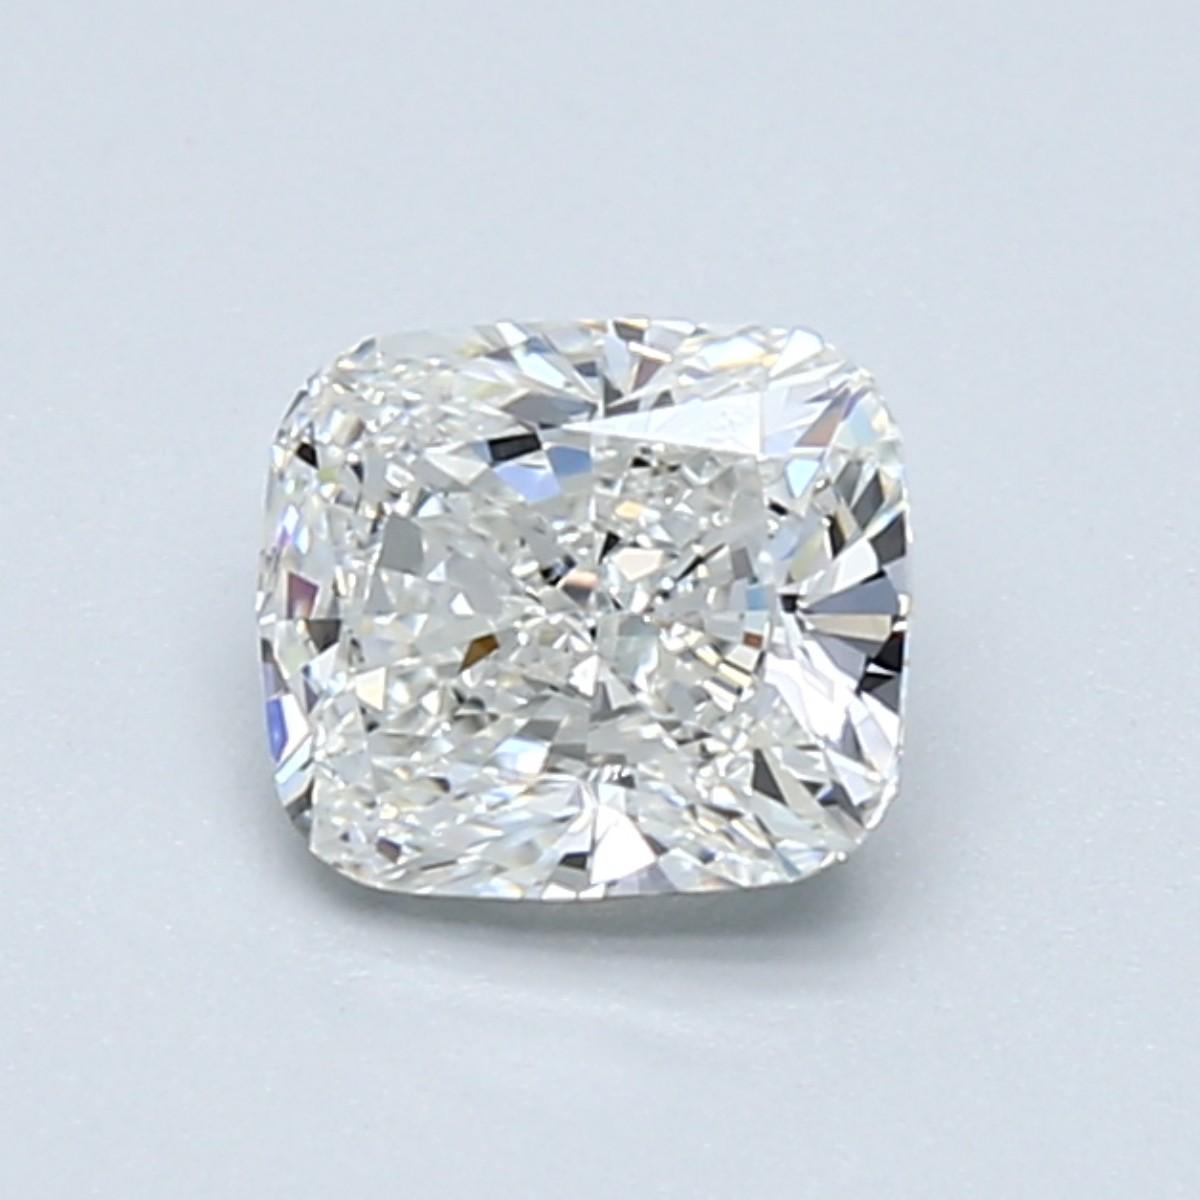 Blue Nile 1.01克拉 垫形钻石(切工VG,成色H,净度VS1)